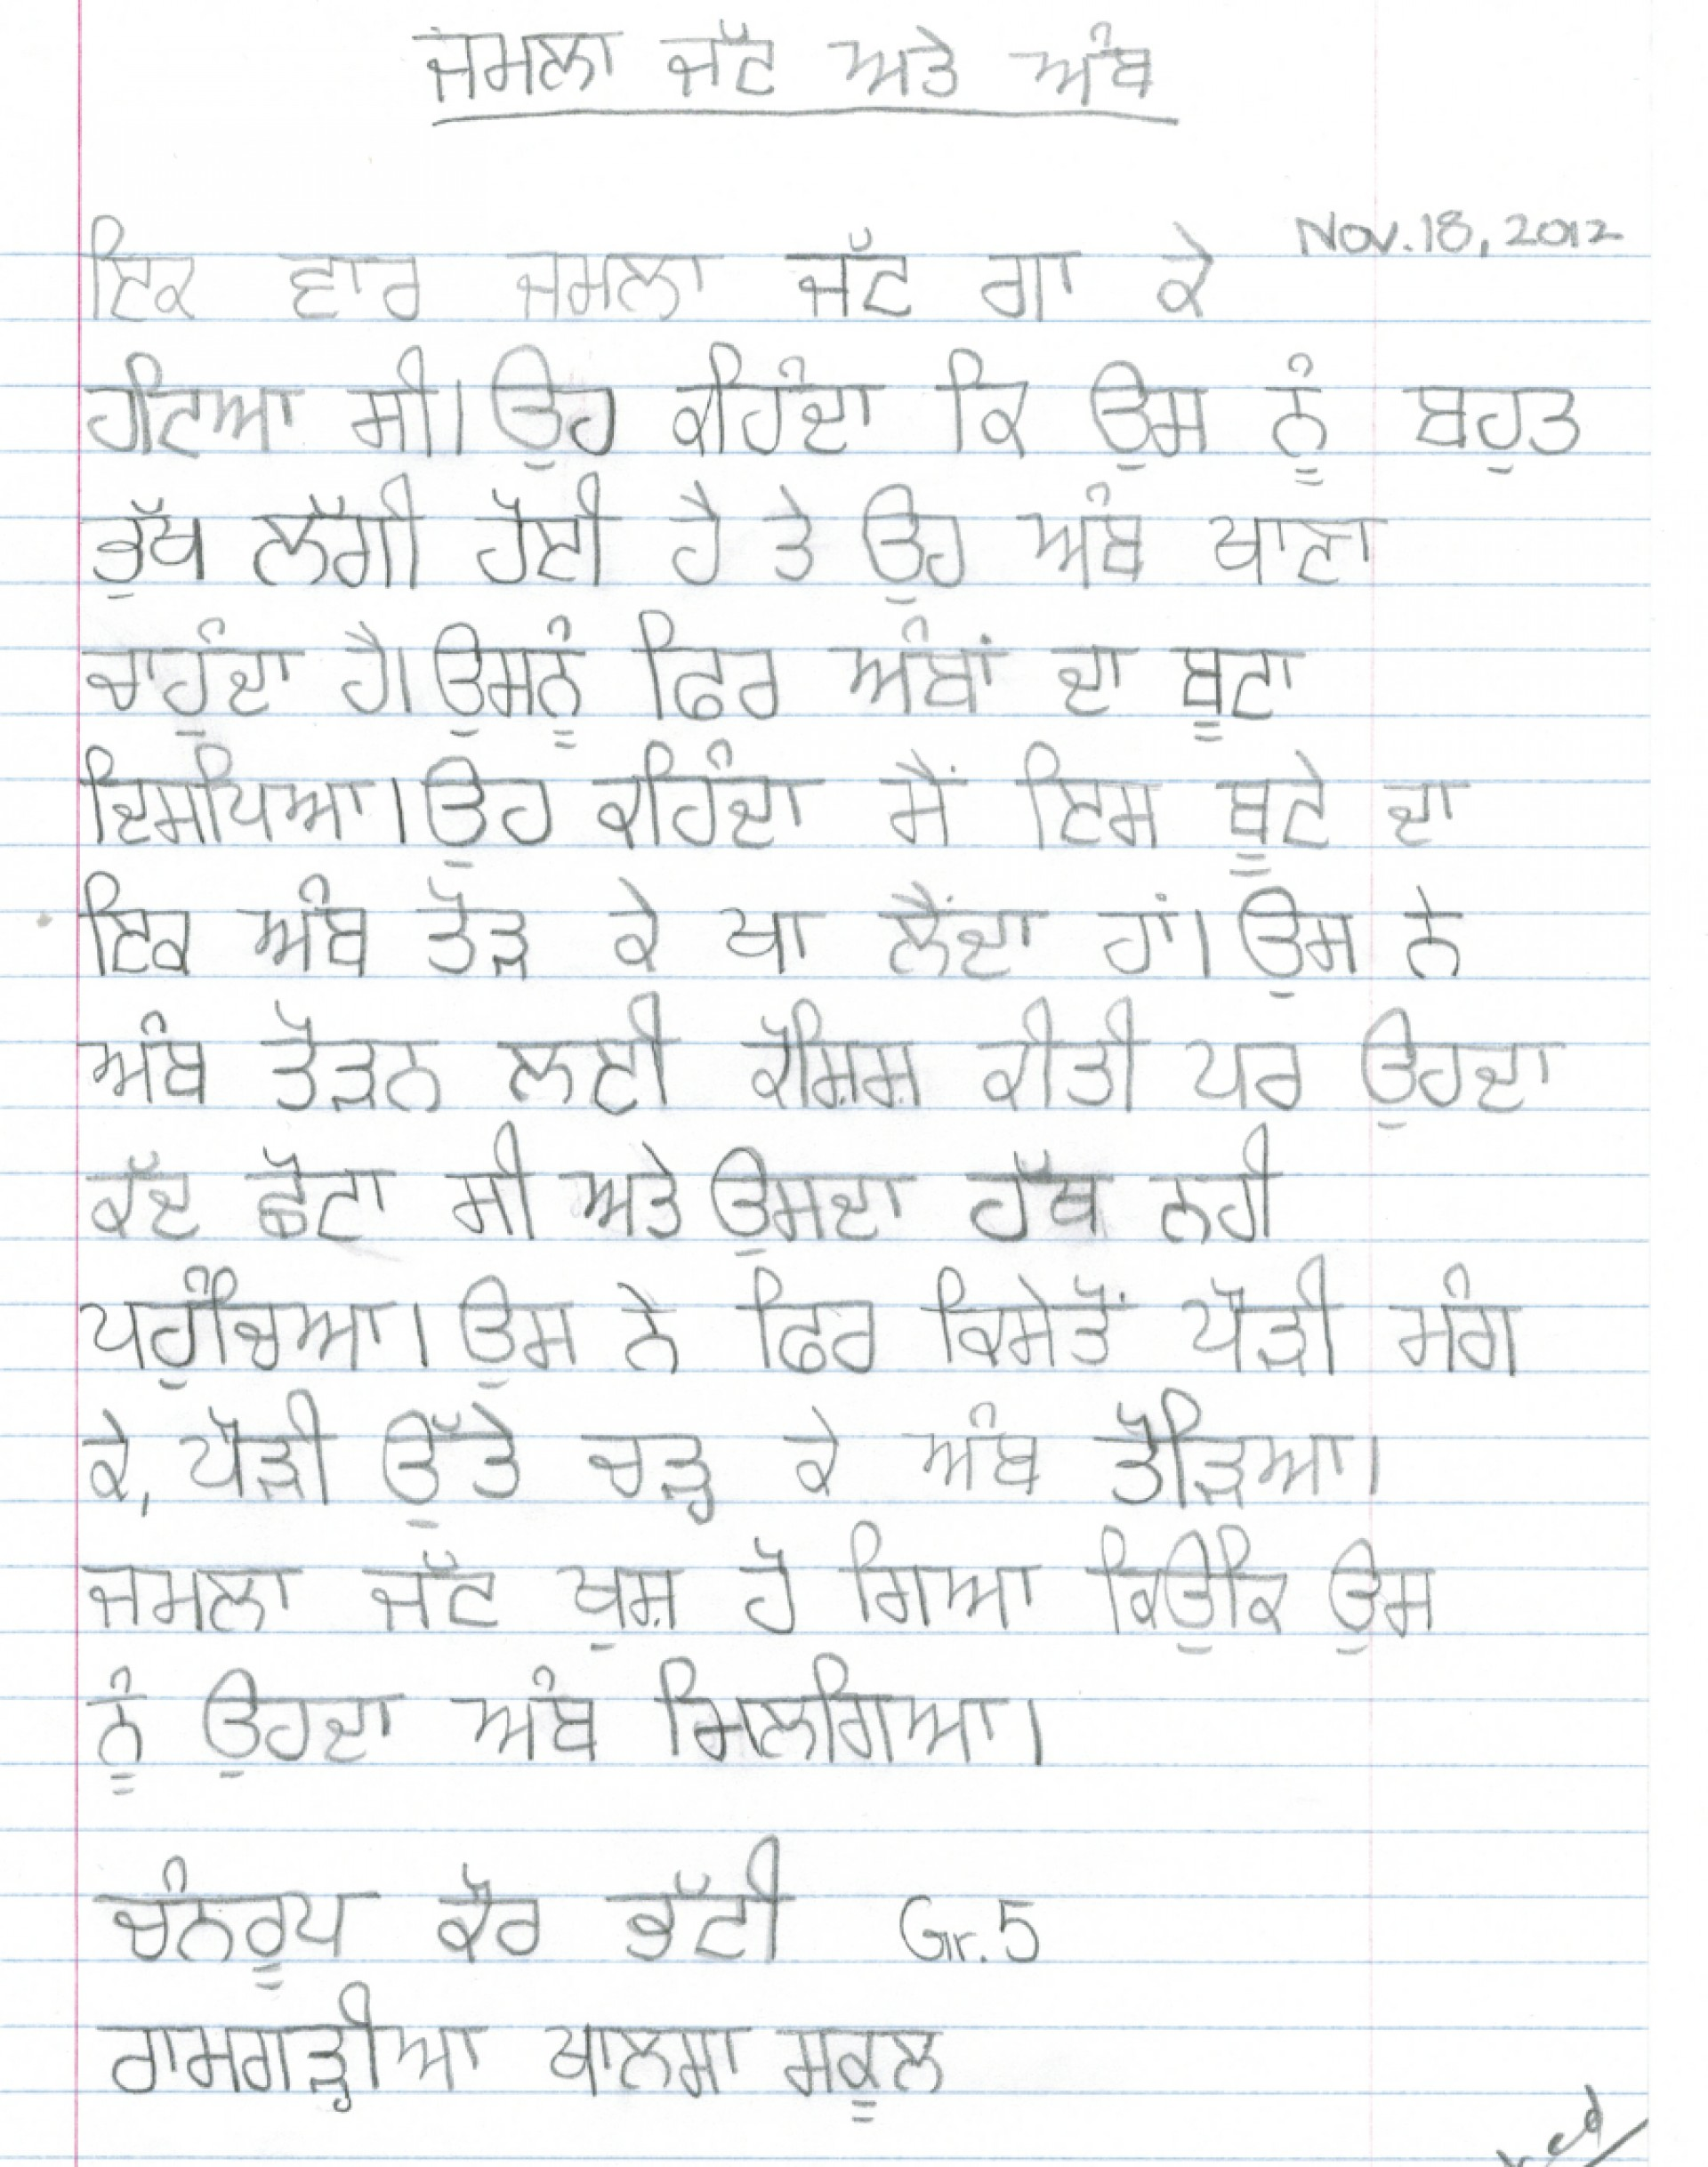 004 Qualities Of Good Friend Essay Screen252bshot252b2013 20252bat252b3 36252bpm Exceptional A In Hindi Short 1920